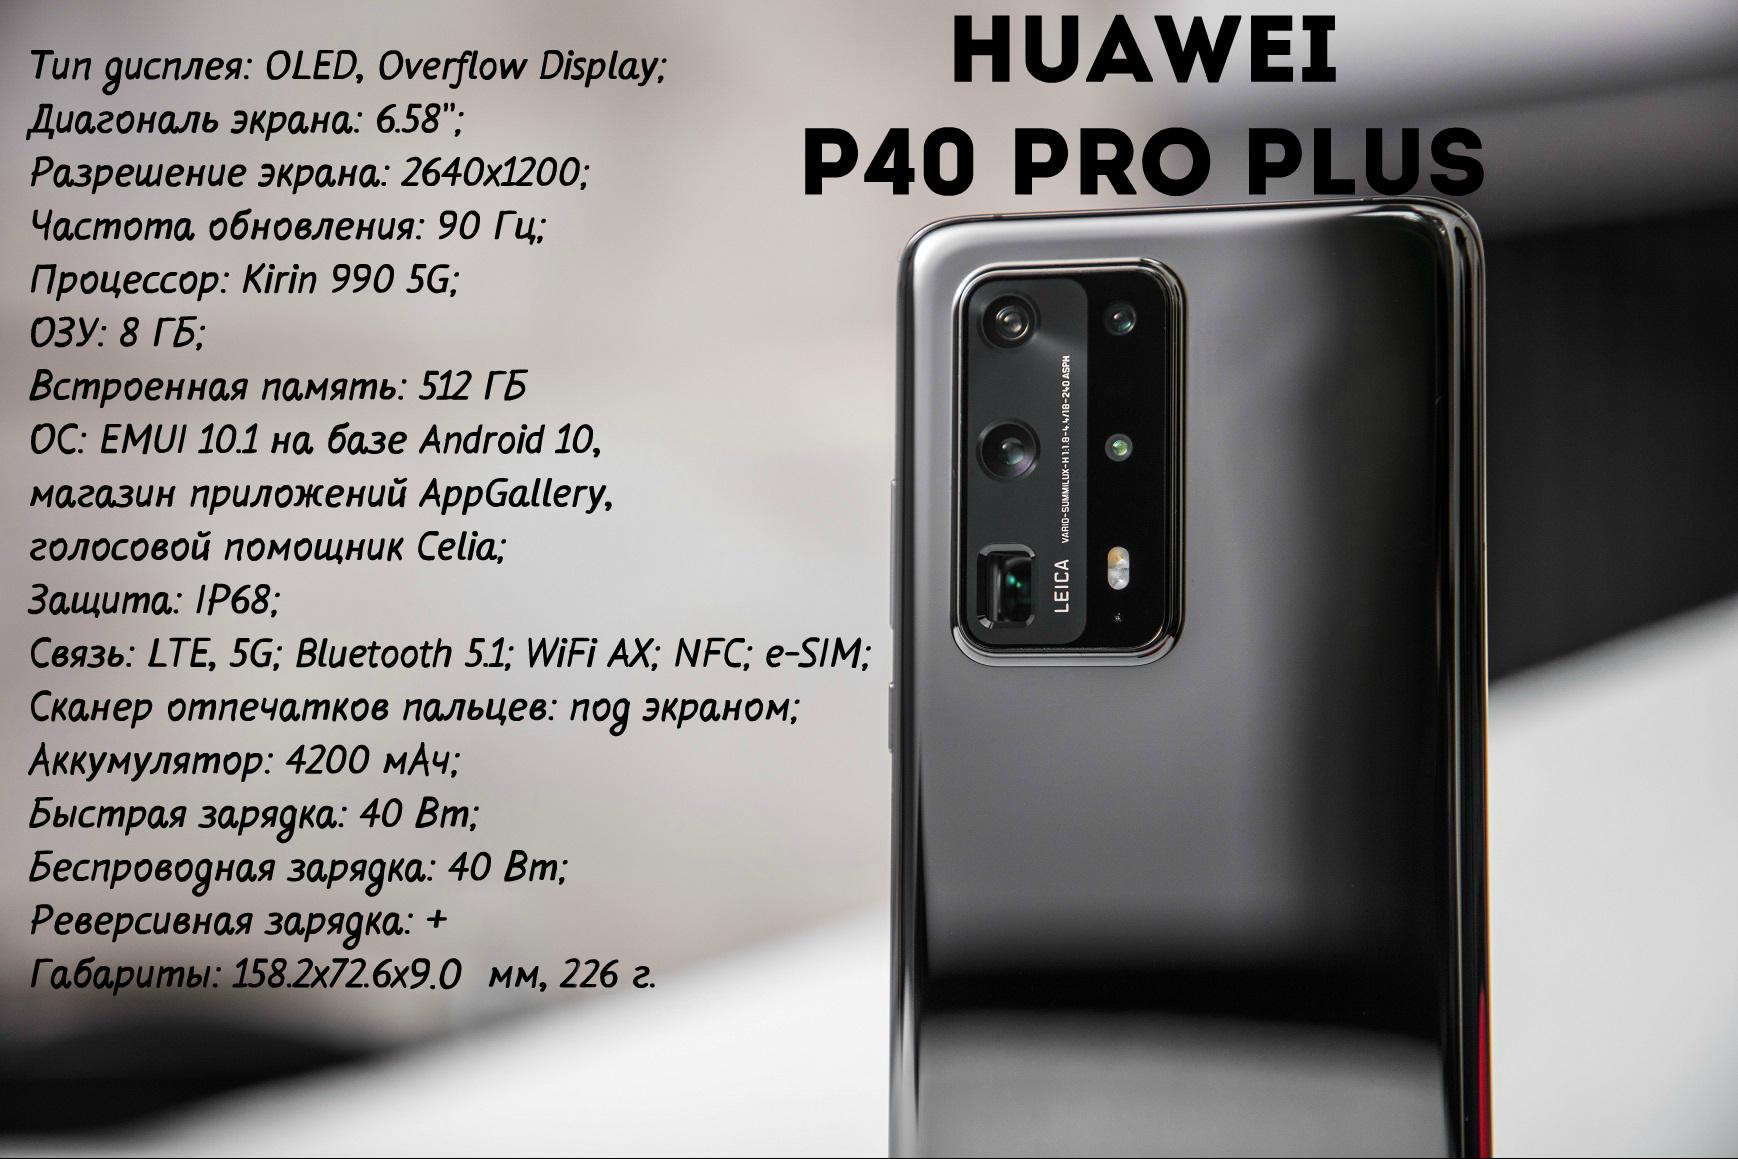 характеристики Huawei P40 Pro Plus